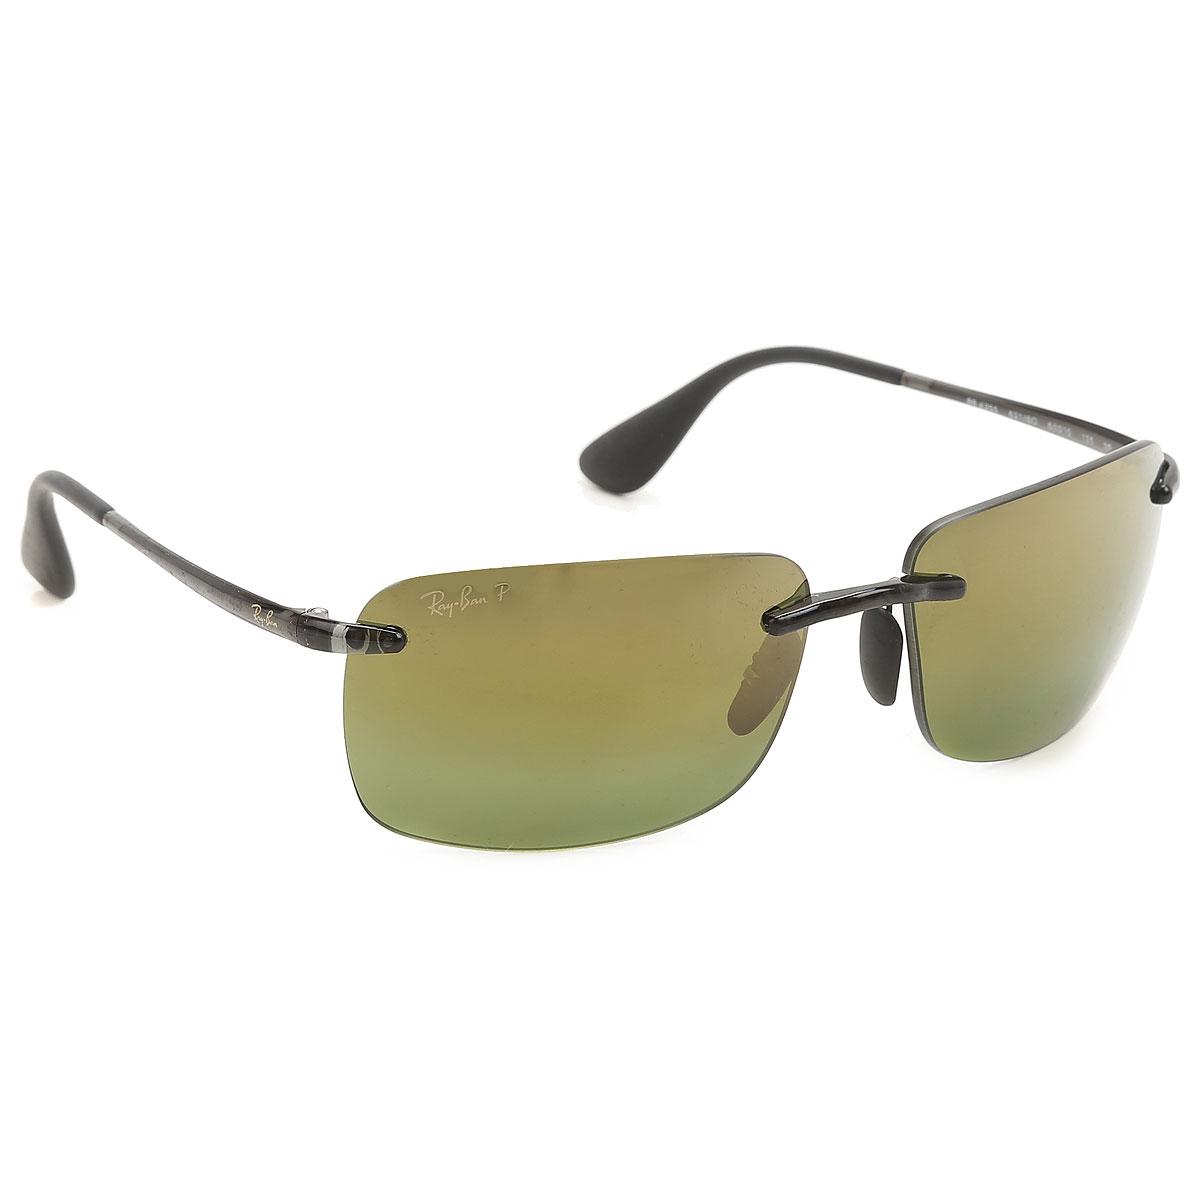 Ray Ban Sunglasses On Sale, Grey, 2019